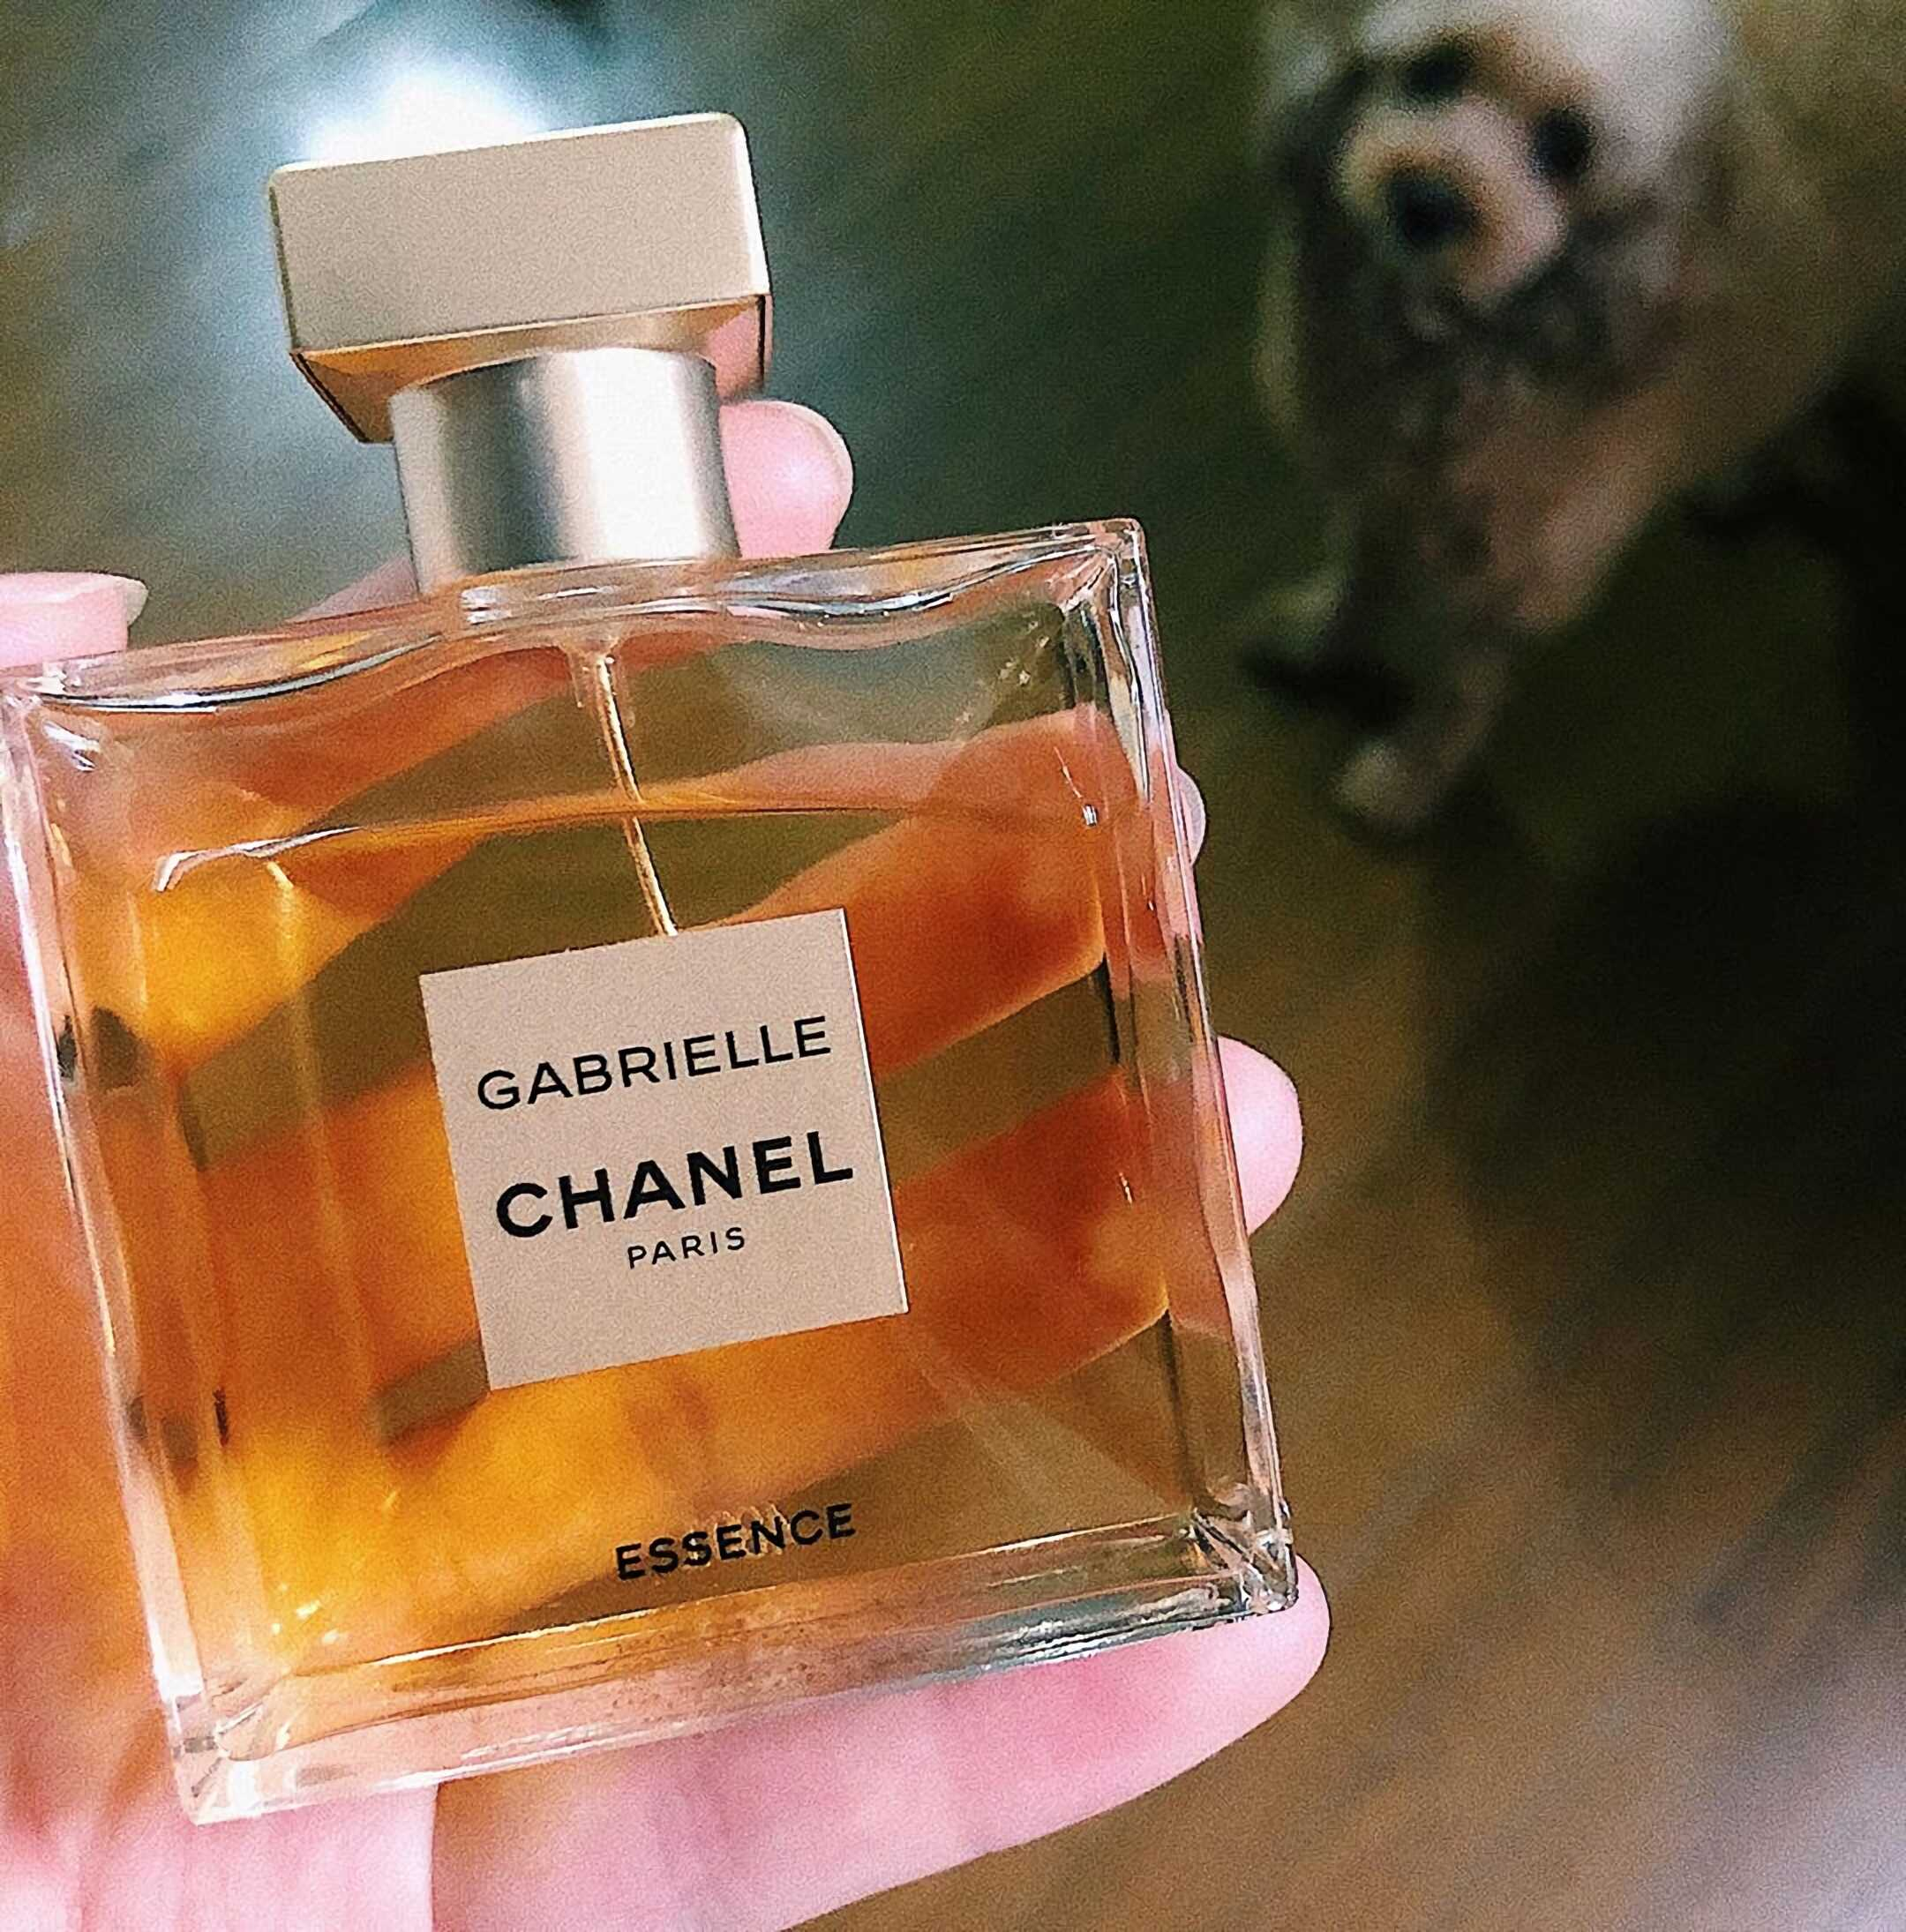 лучший женственный аромат Gabrielle Chanel